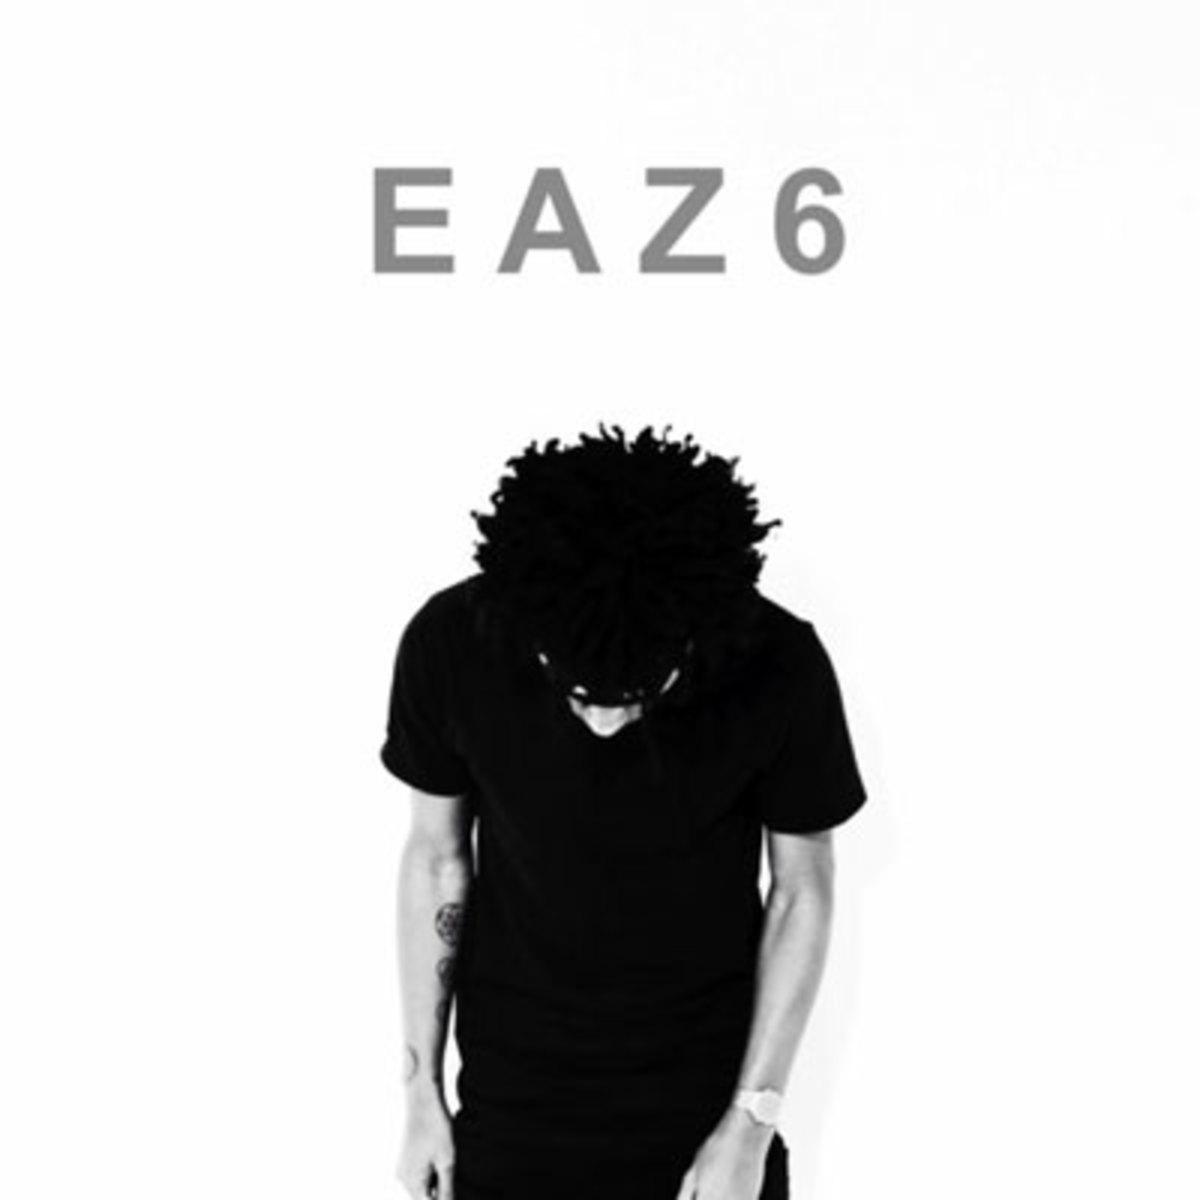 6lack-eaz6.jpg